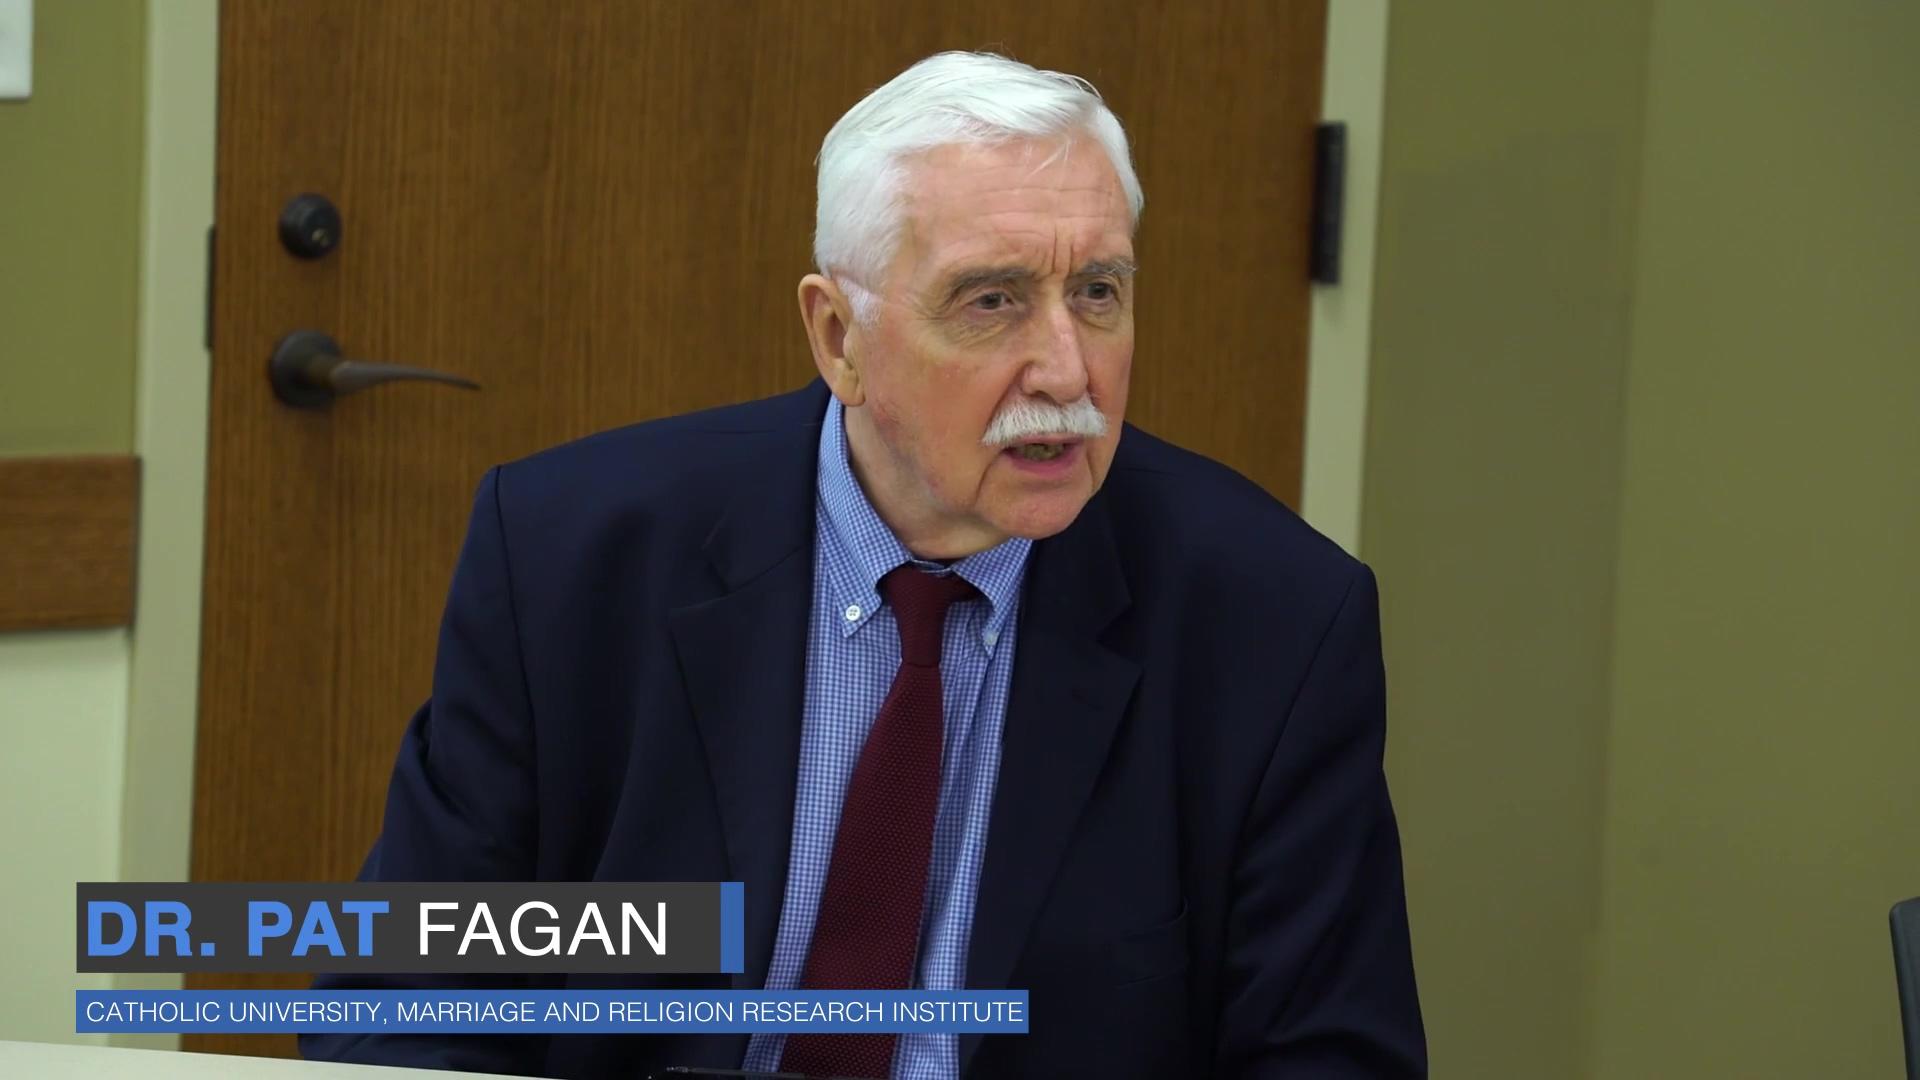 Dr. Pat Fagan Talk